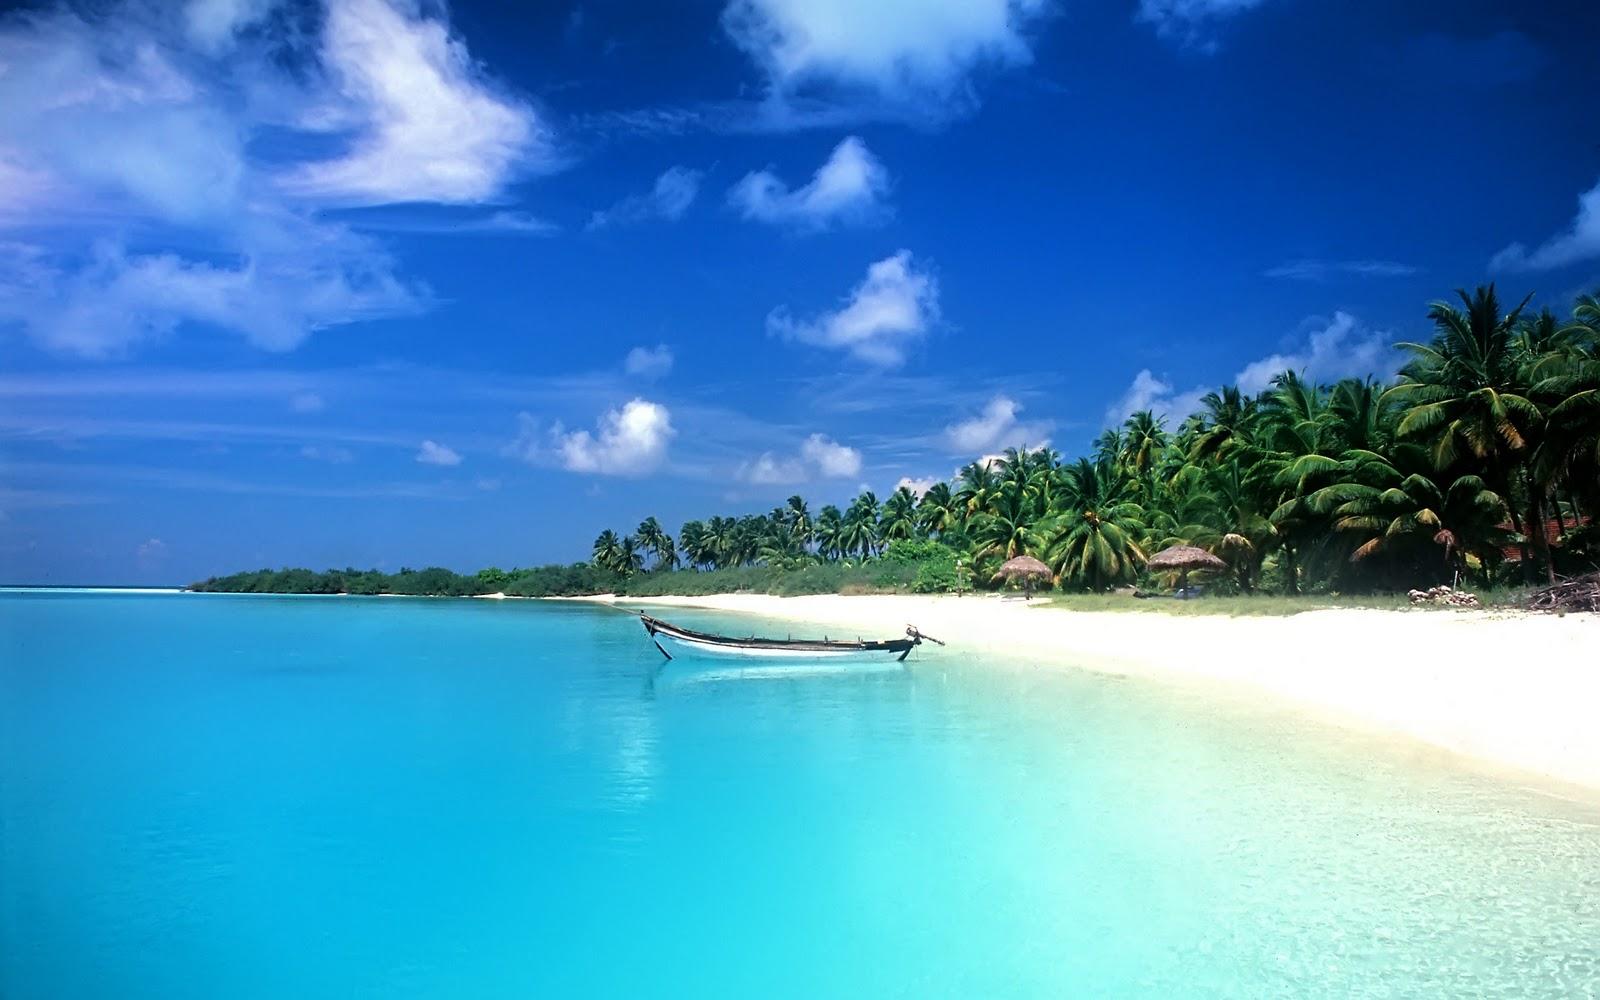 http://4.bp.blogspot.com/-2wCHgrdqr08/TwWJQjR965I/AAAAAAAAAIQ/cuNYO-ql5zk/s1600/Beach+Wallpapers+HD+1.jpg